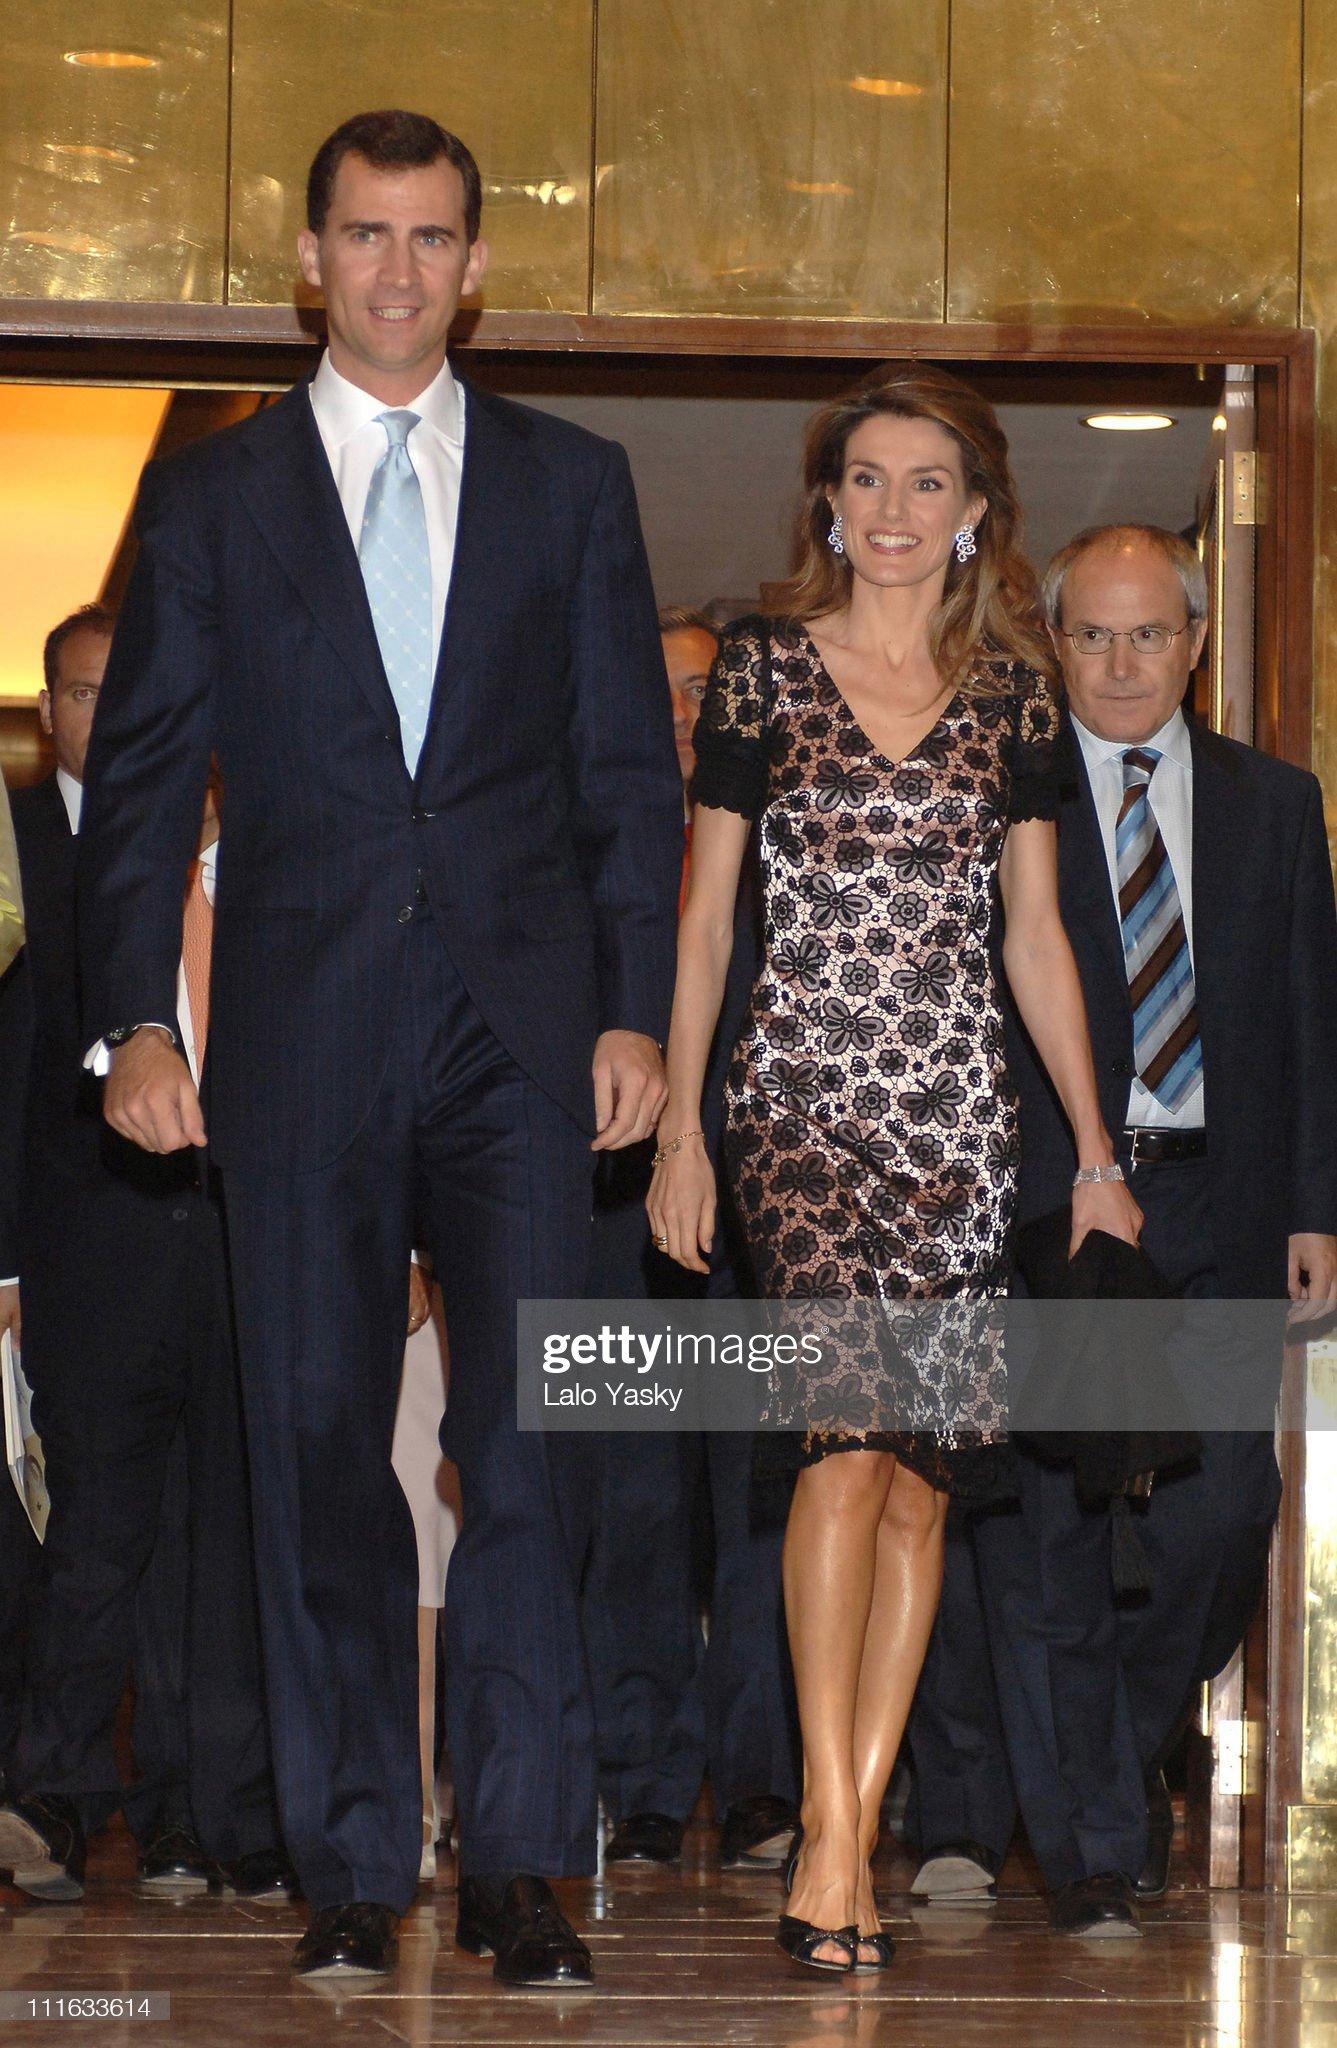 Prince Felipe and Princess Letizia Preside Annual COTEC Foundation Dinner - June 15, 2006 : News Photo